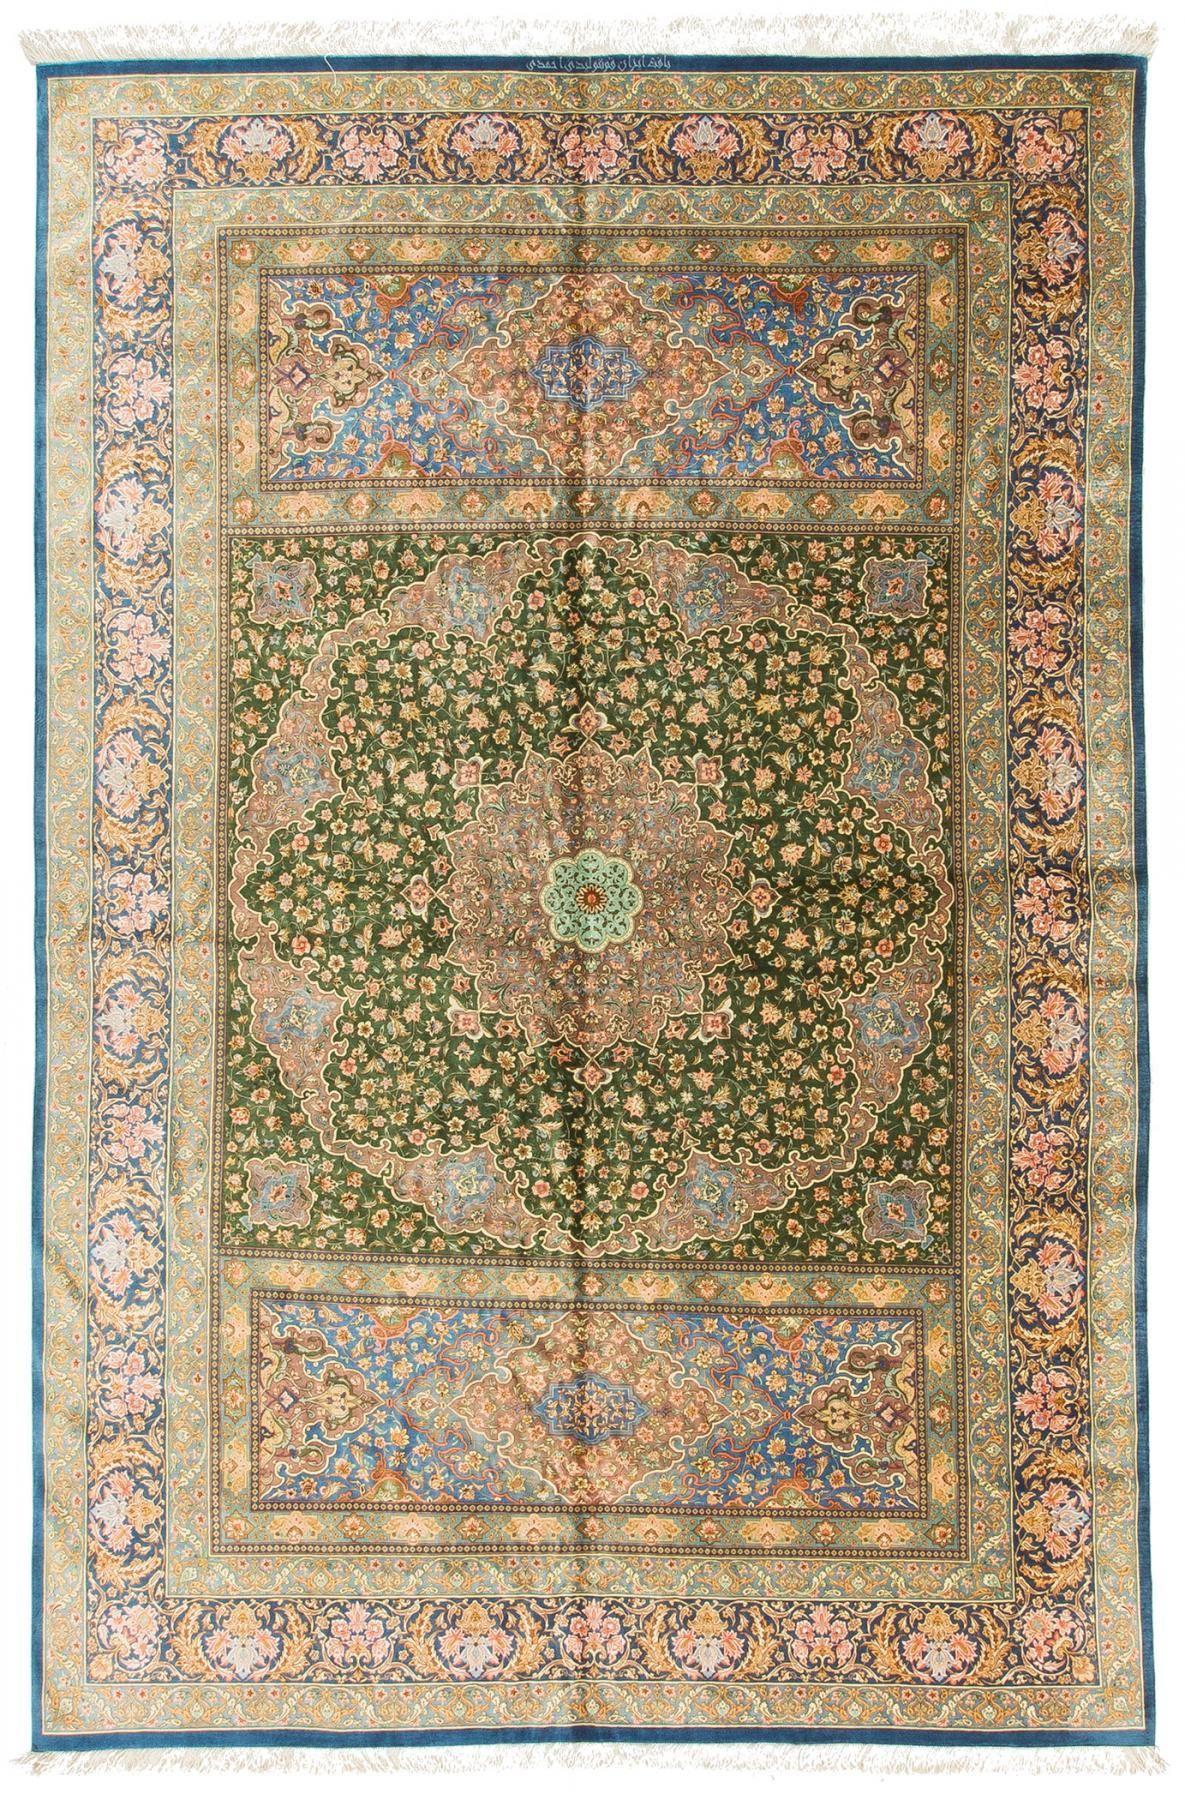 Rug Pf166405 Persian Qum Persian Classics Area Rugs By Hali Minyaturler Tezhip